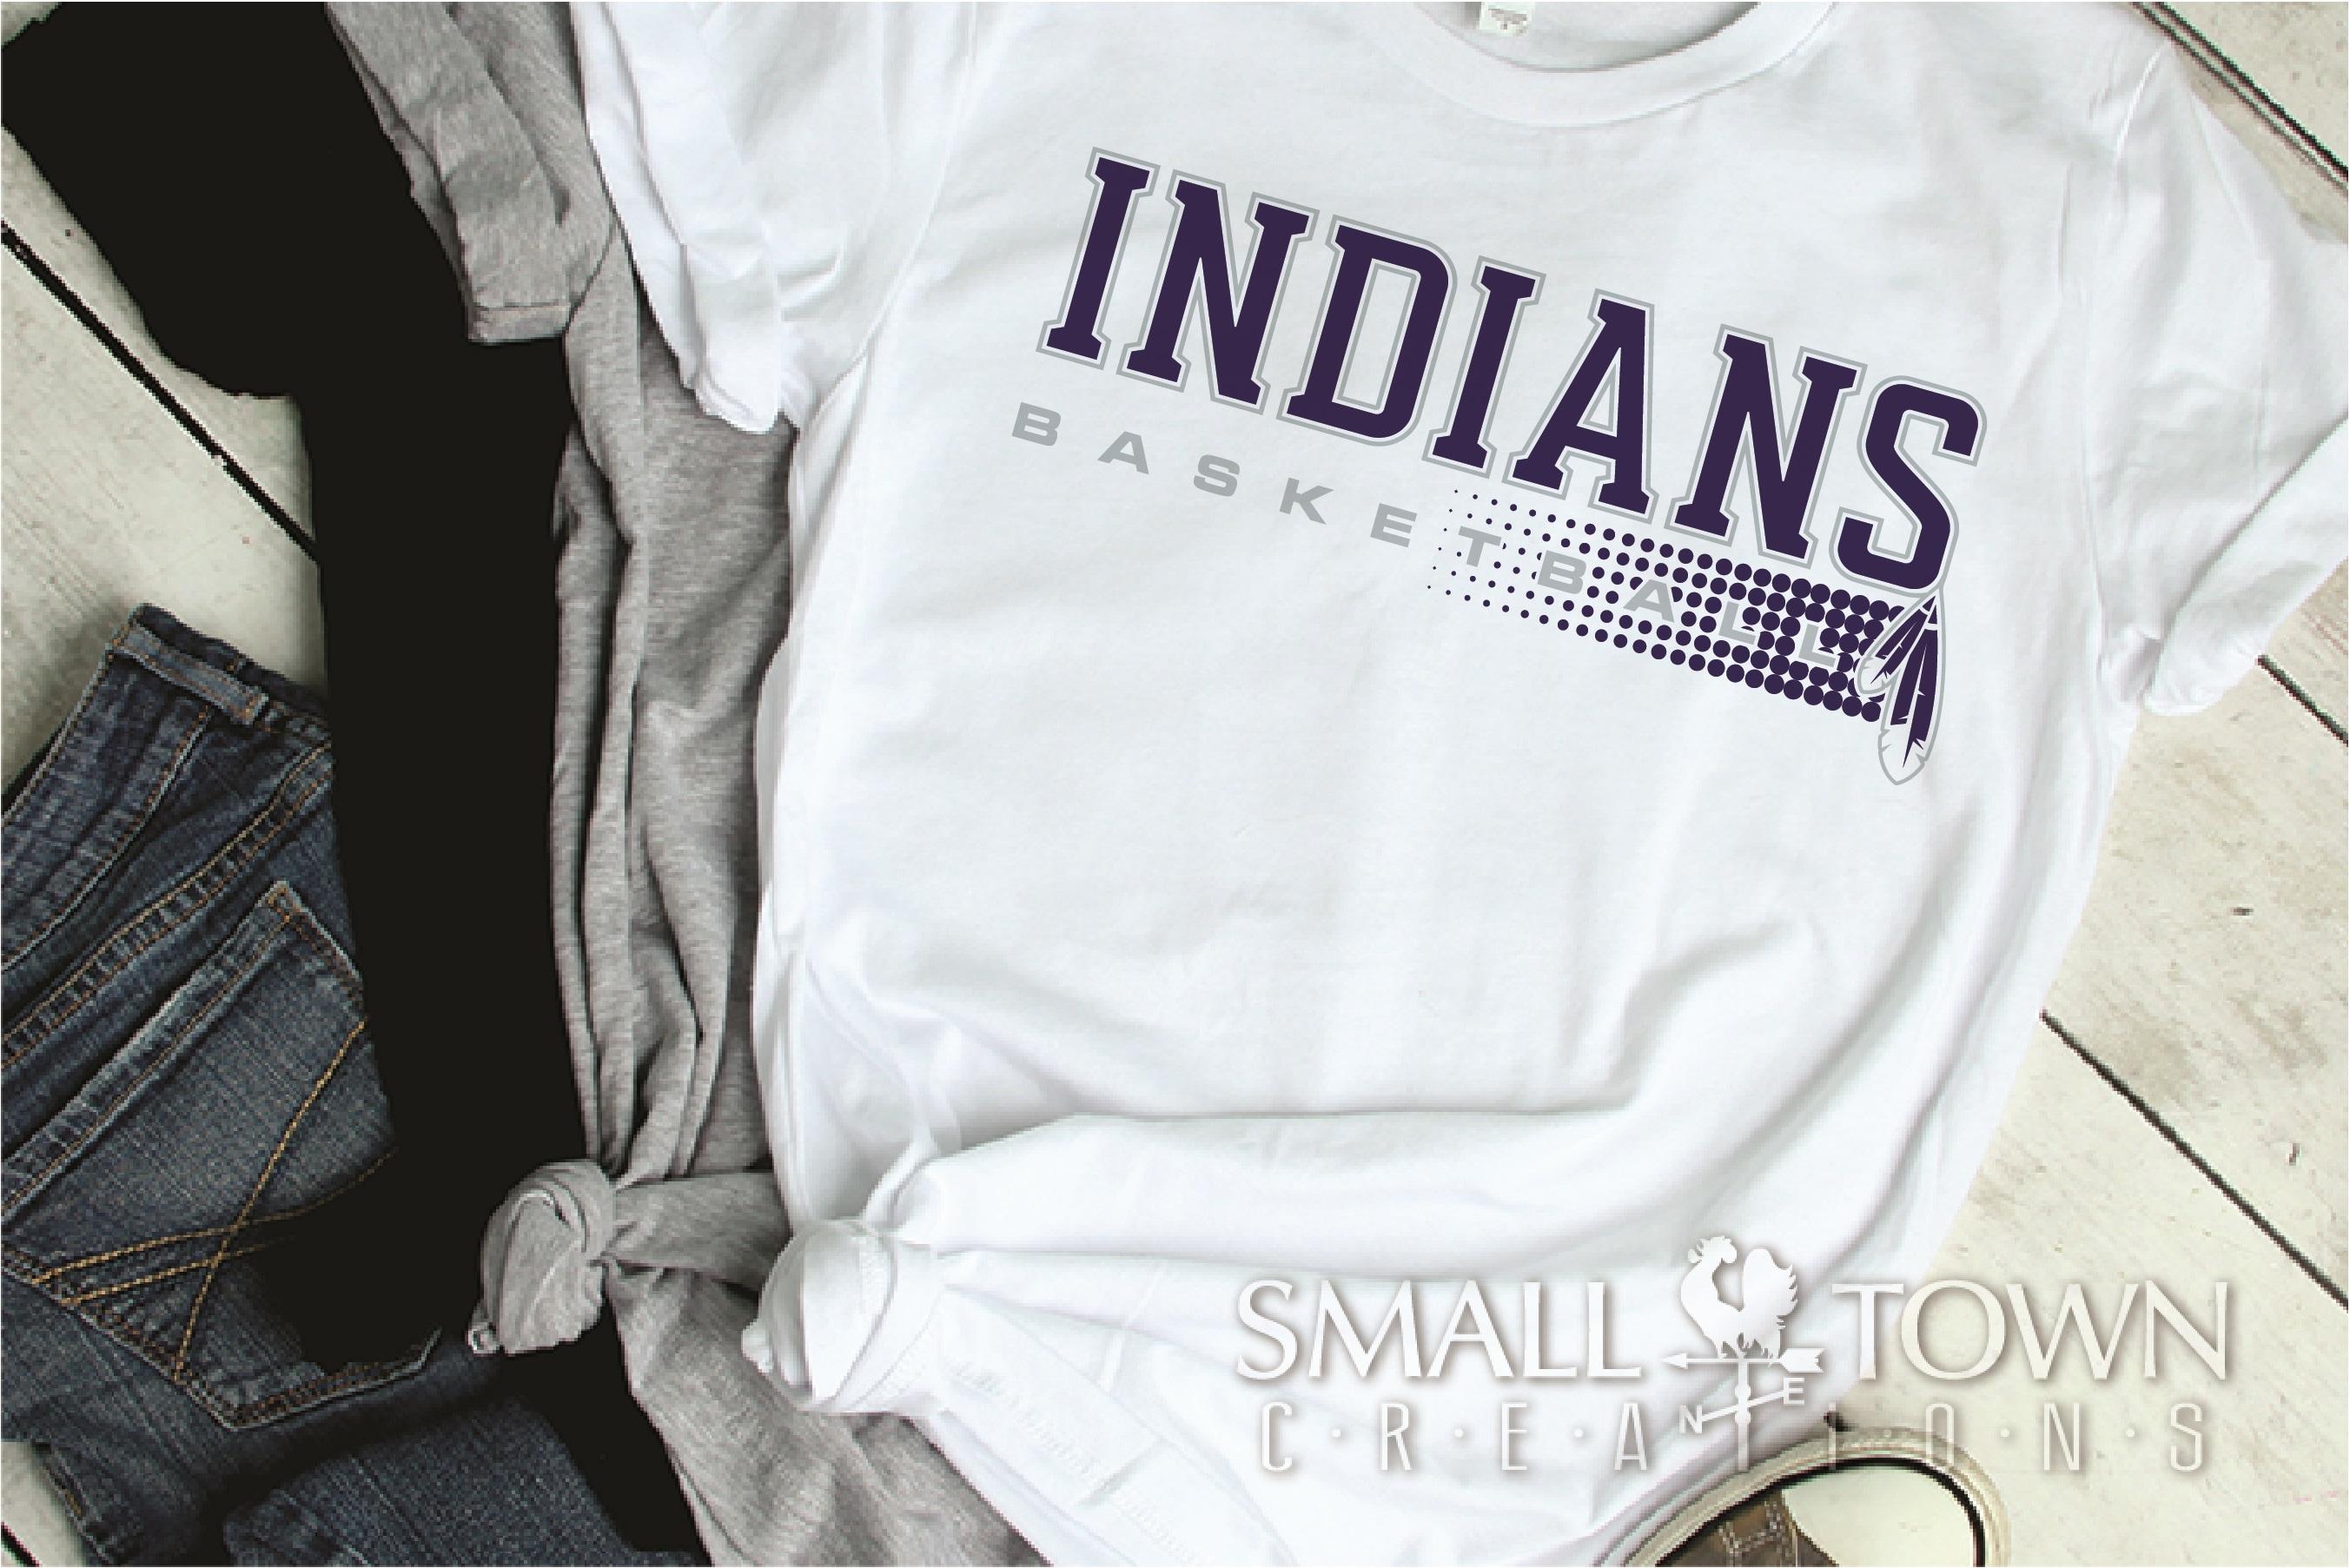 Indian, Indian basketball, Team, logo, PRINT, CUT & DESIGN example image 2